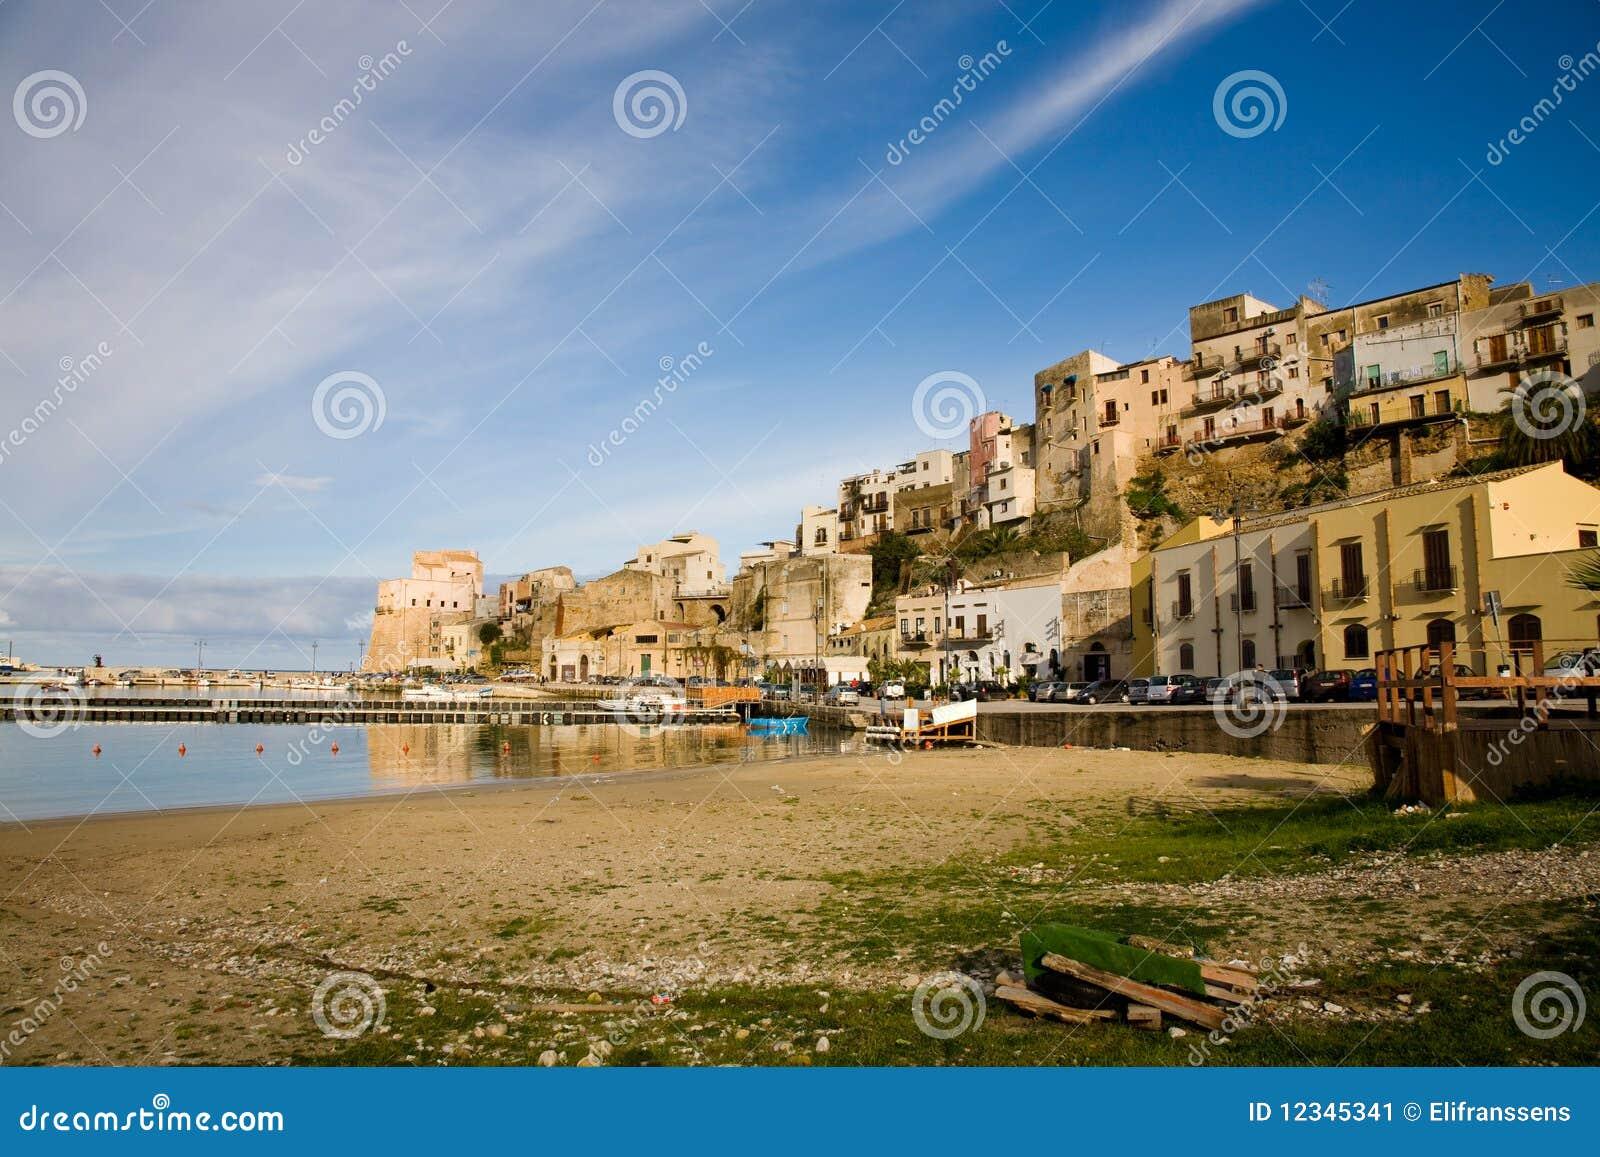 Castellammare del Golfo Italy  city photos gallery : ... Castellammare del Golfo in the province of Trapani in Sicily, Italy